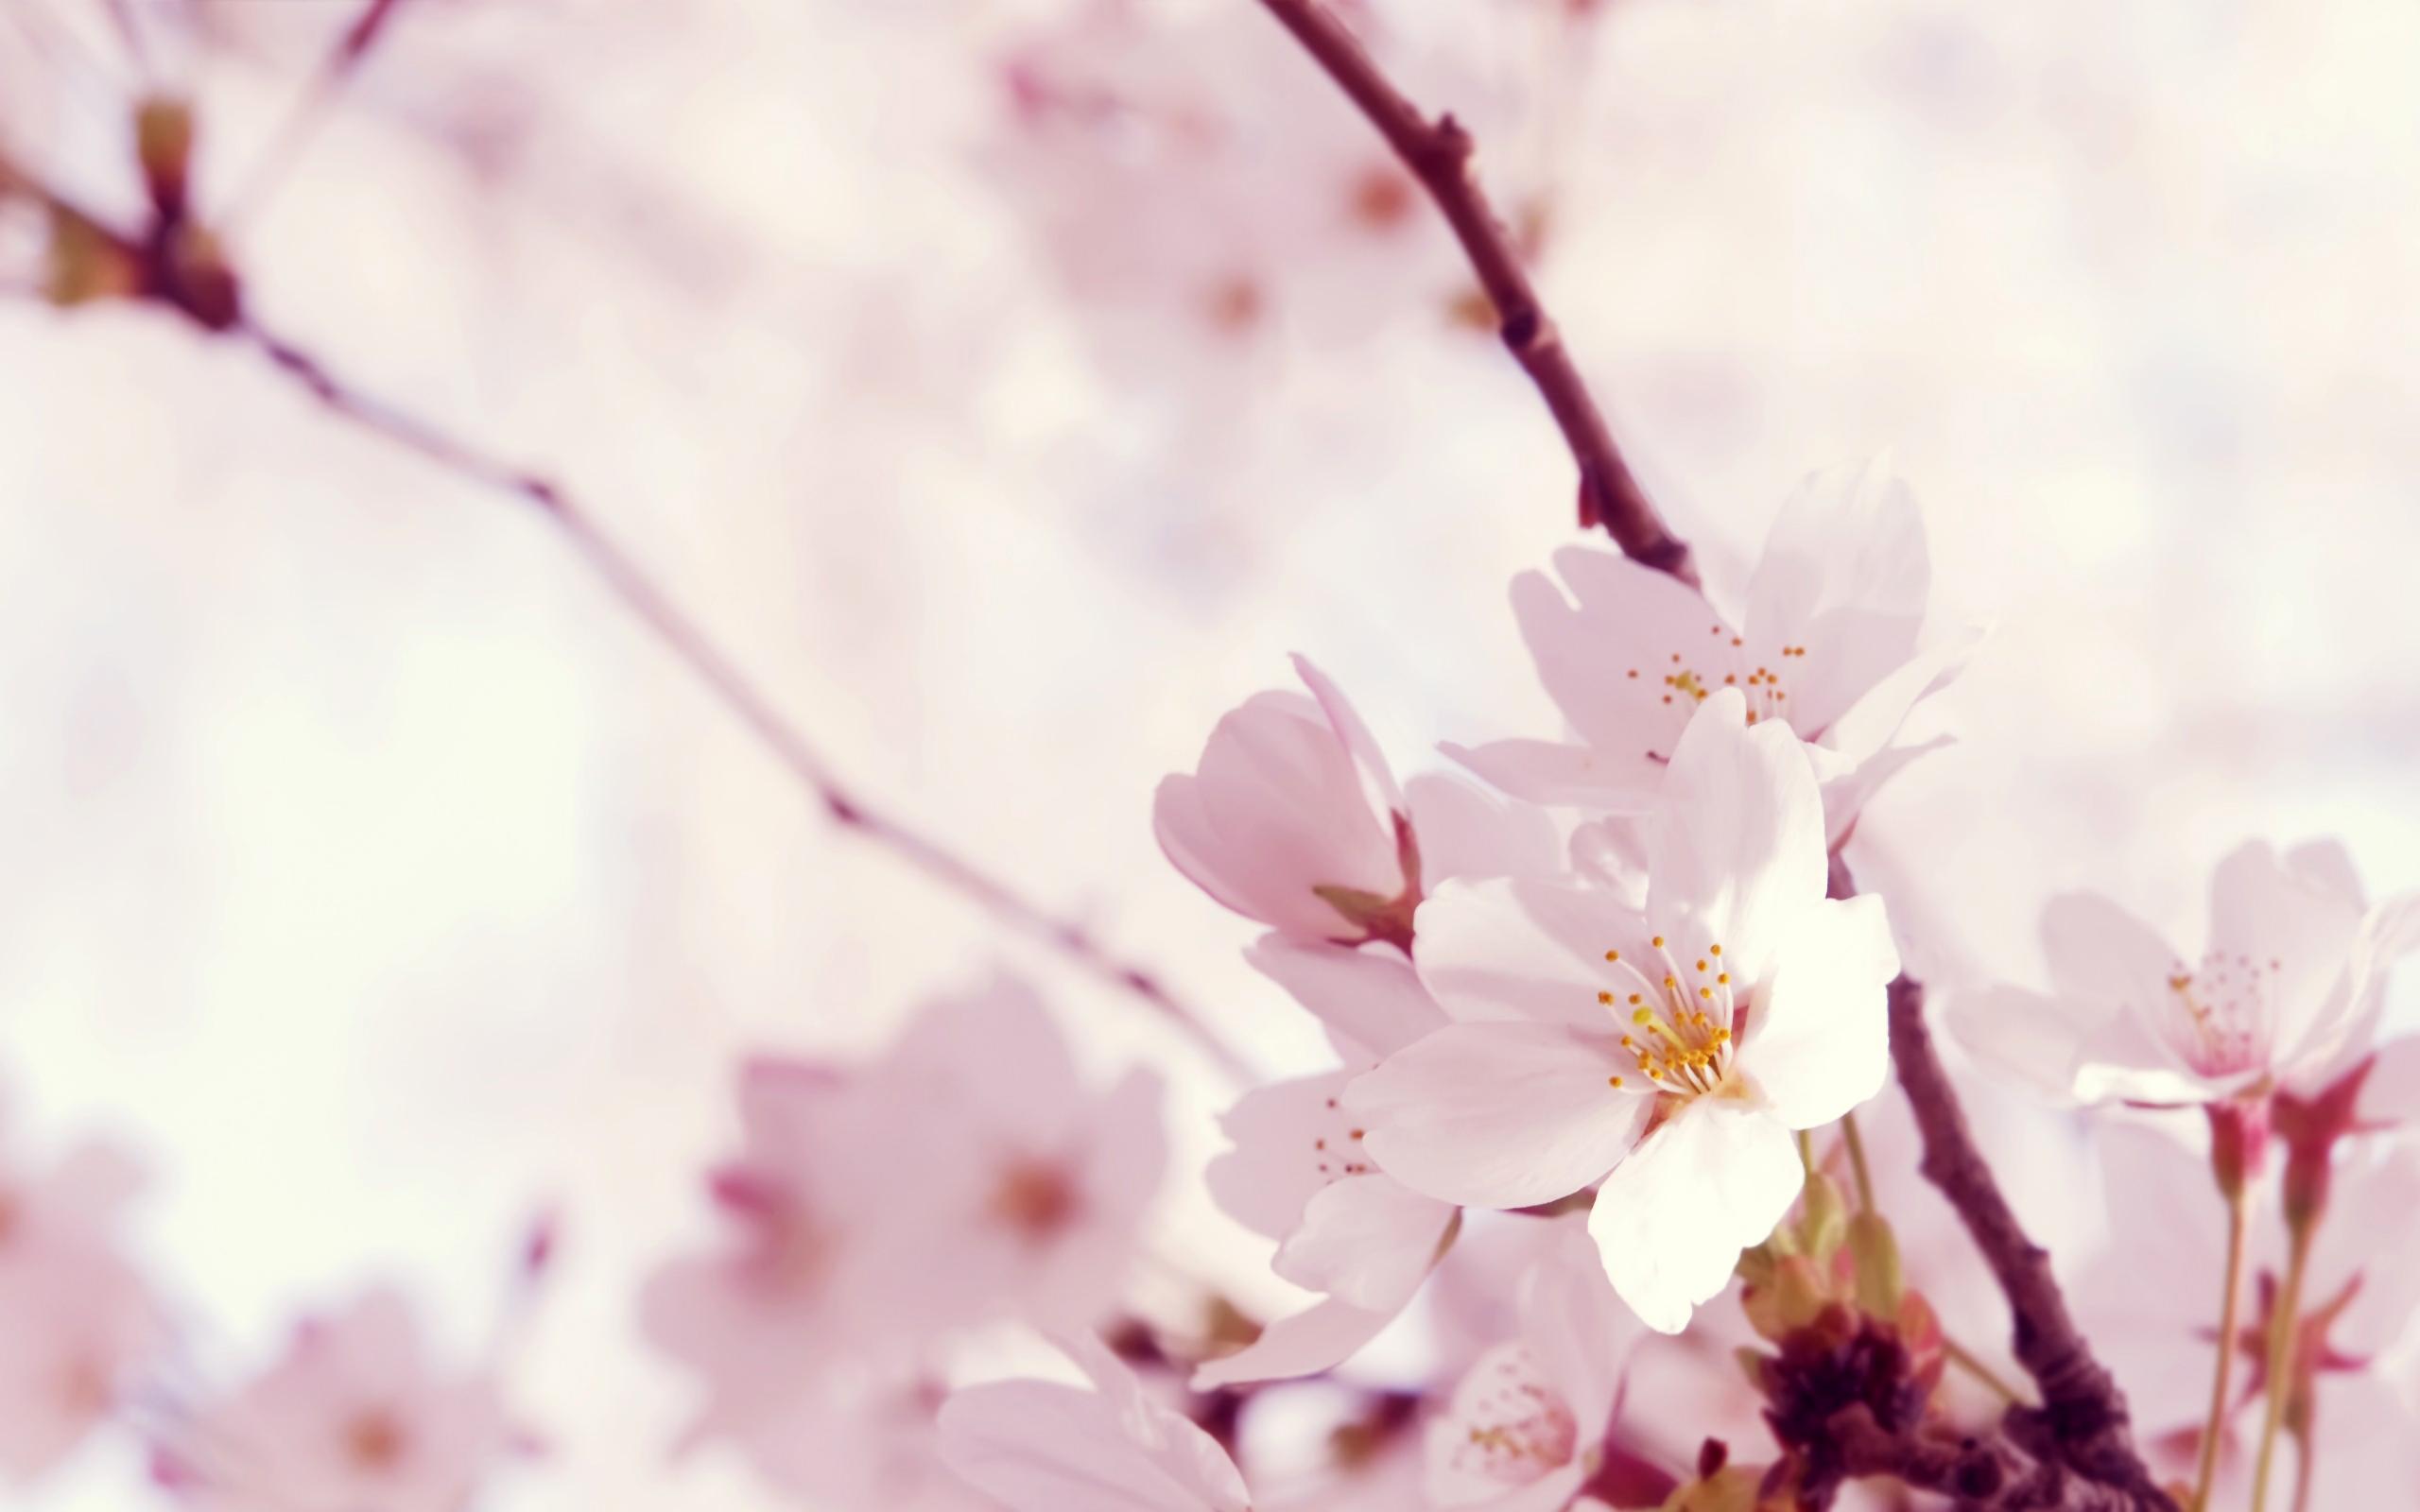 Bright Pink Flowers Wallpaper 2560x1600 73977